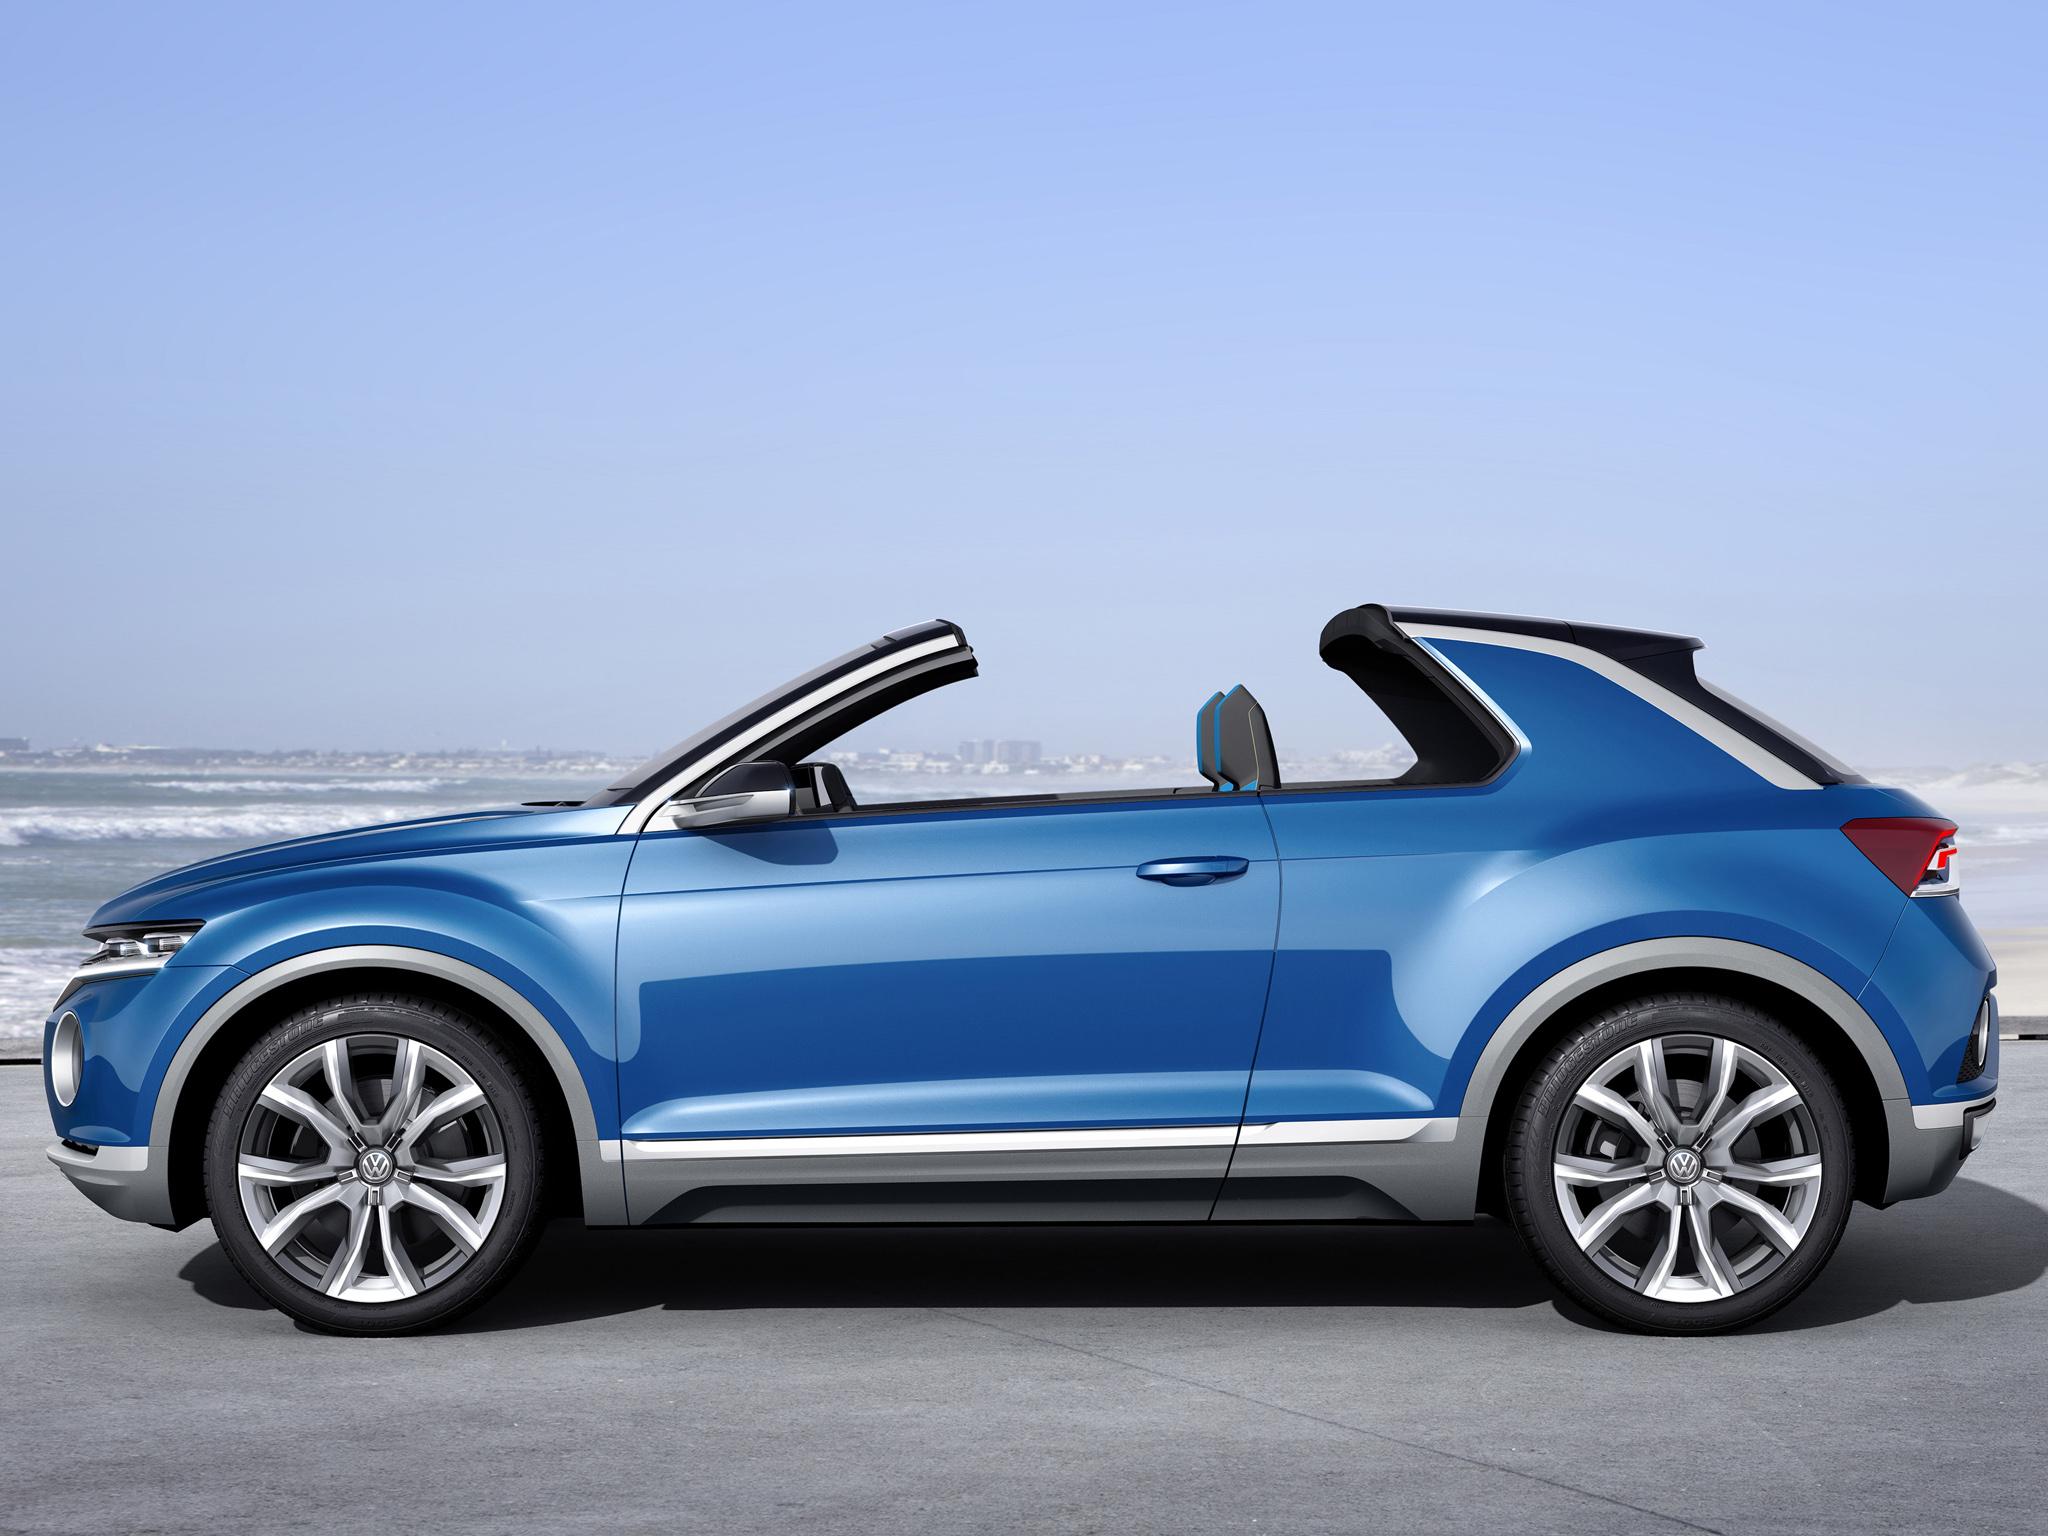 volkswagen t roc will go on sale in late 2017 autoevolution. Black Bedroom Furniture Sets. Home Design Ideas